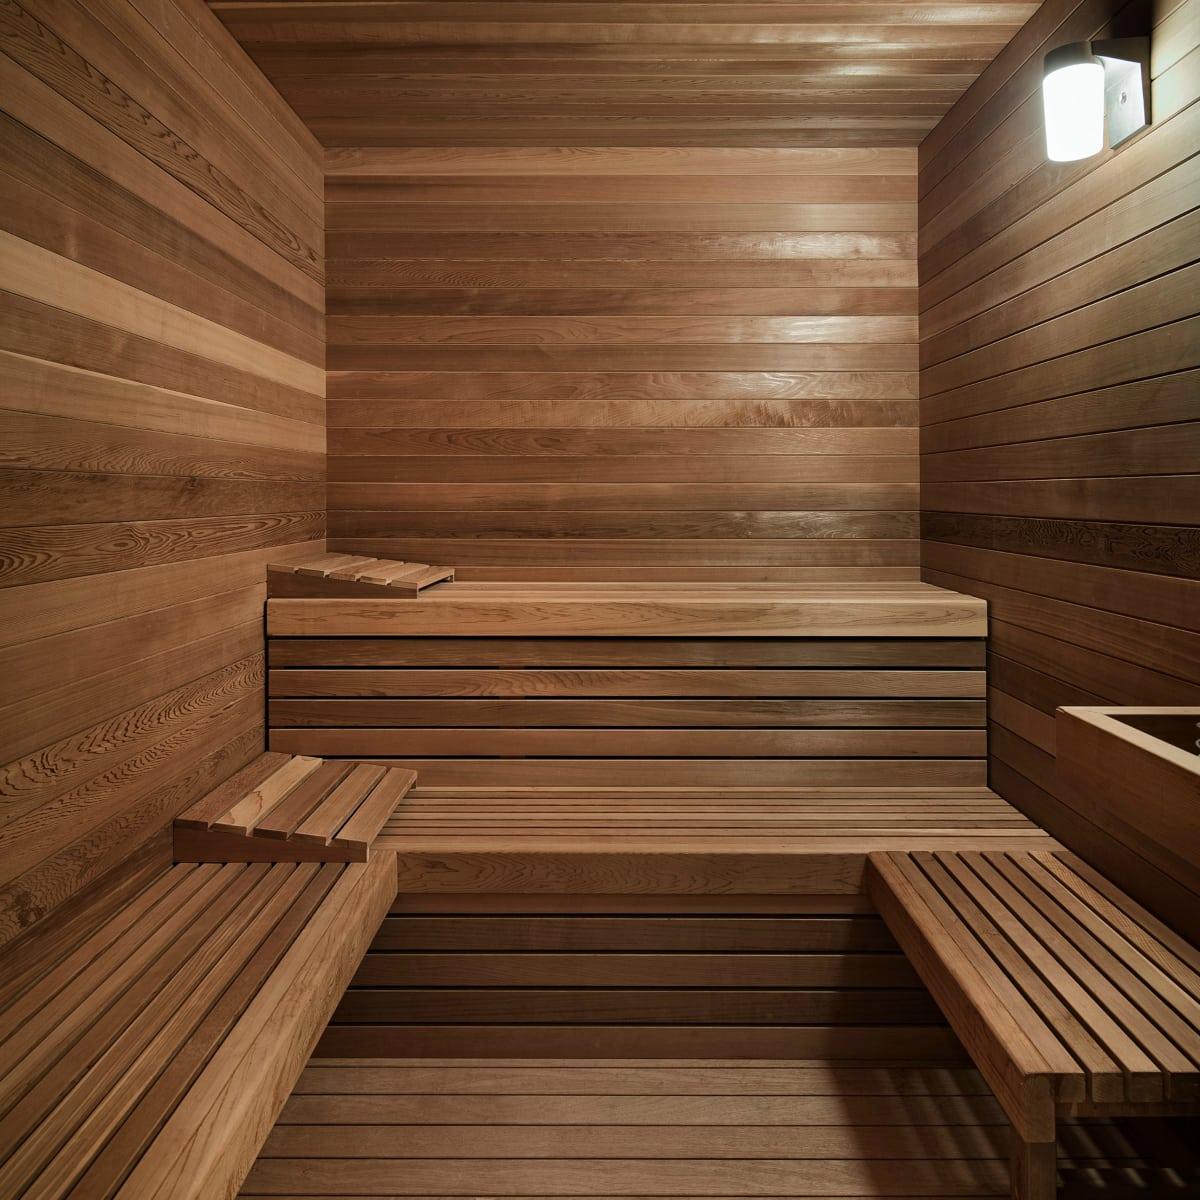 Austin home Floating Box House 900 Live Oak Circle West Lake Hills 78746 April 2016 sauna